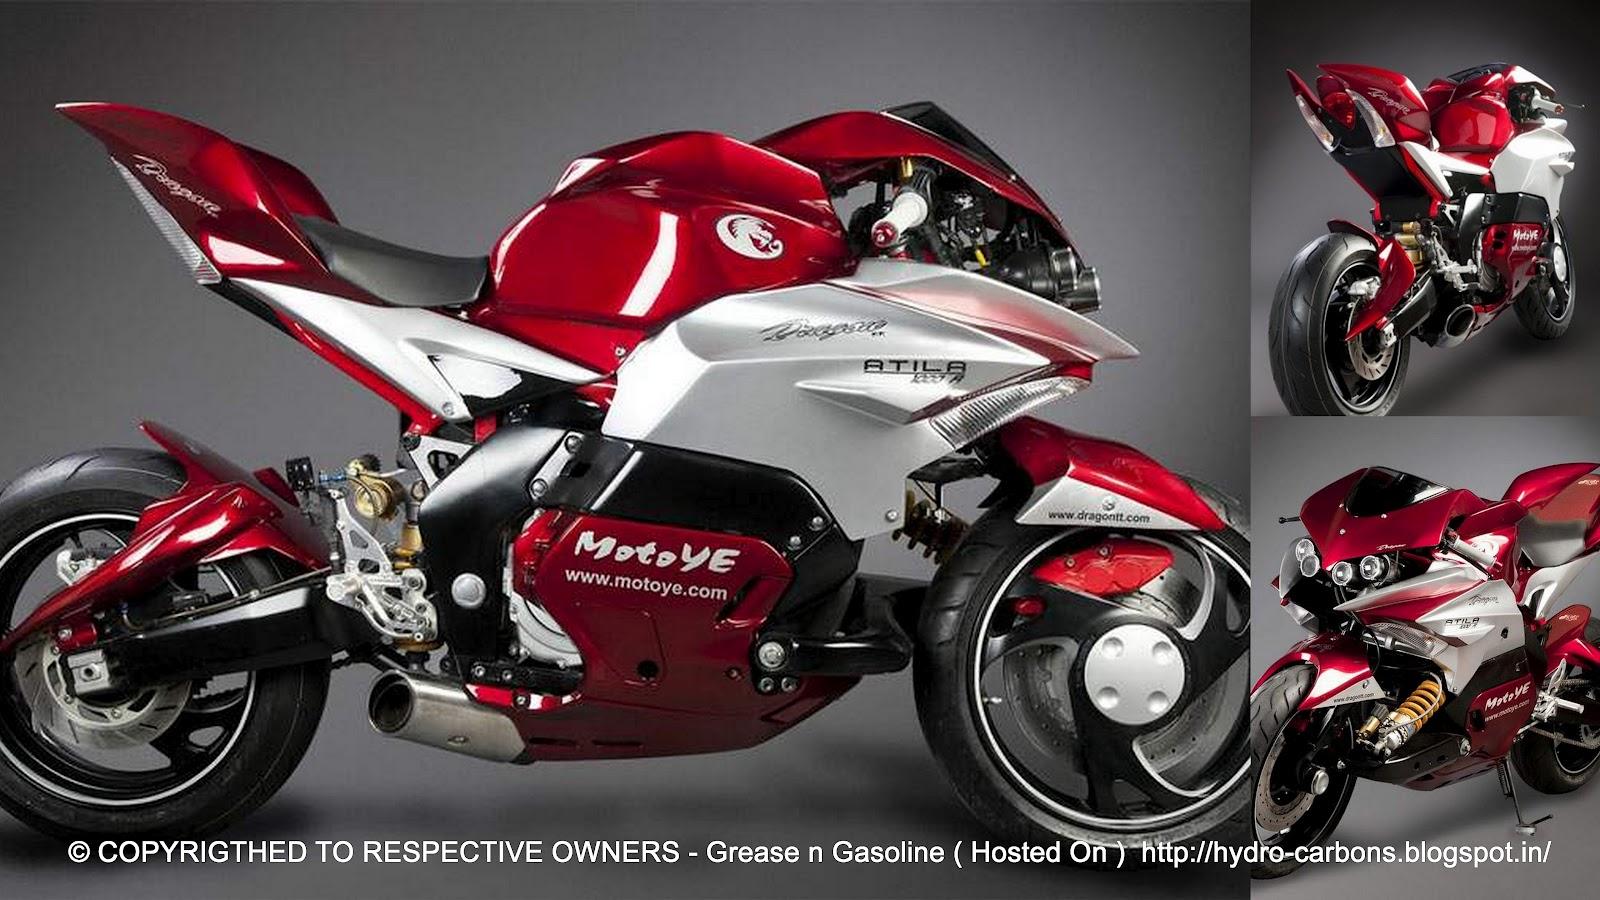 concept motorcycles bikes - photo #29